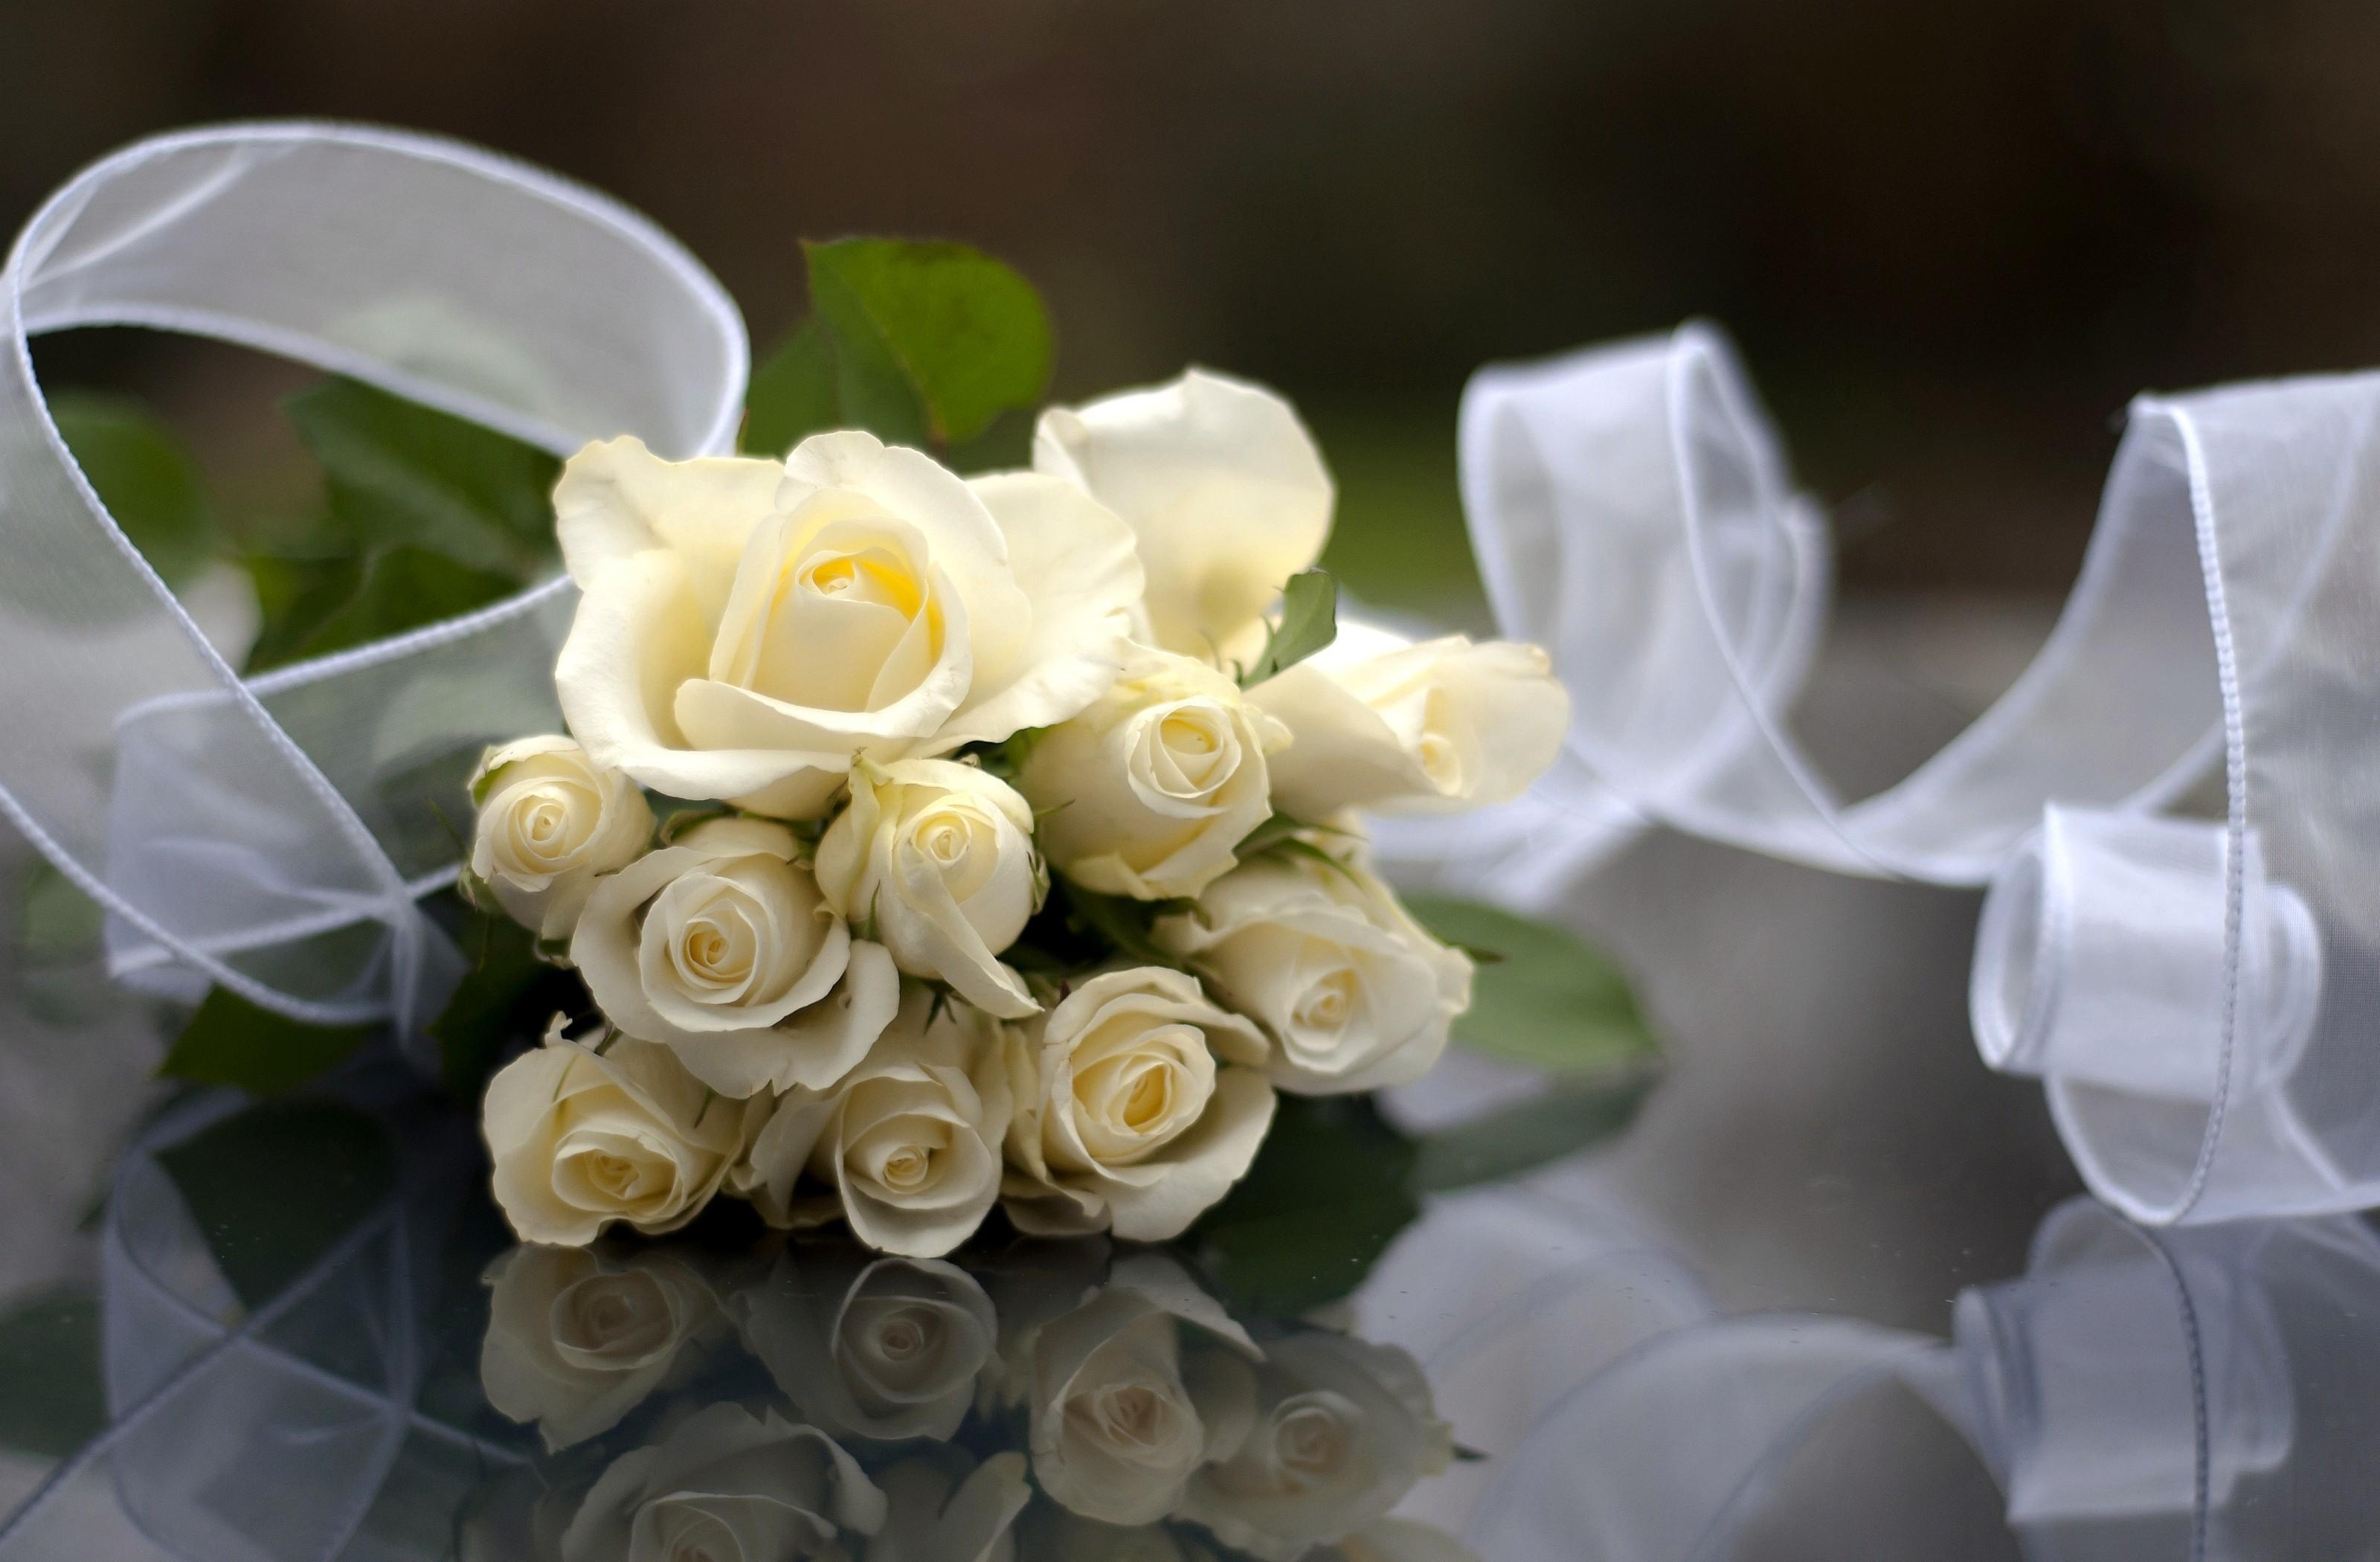 wallpaper rose white flowers bouquet ribbon reflection